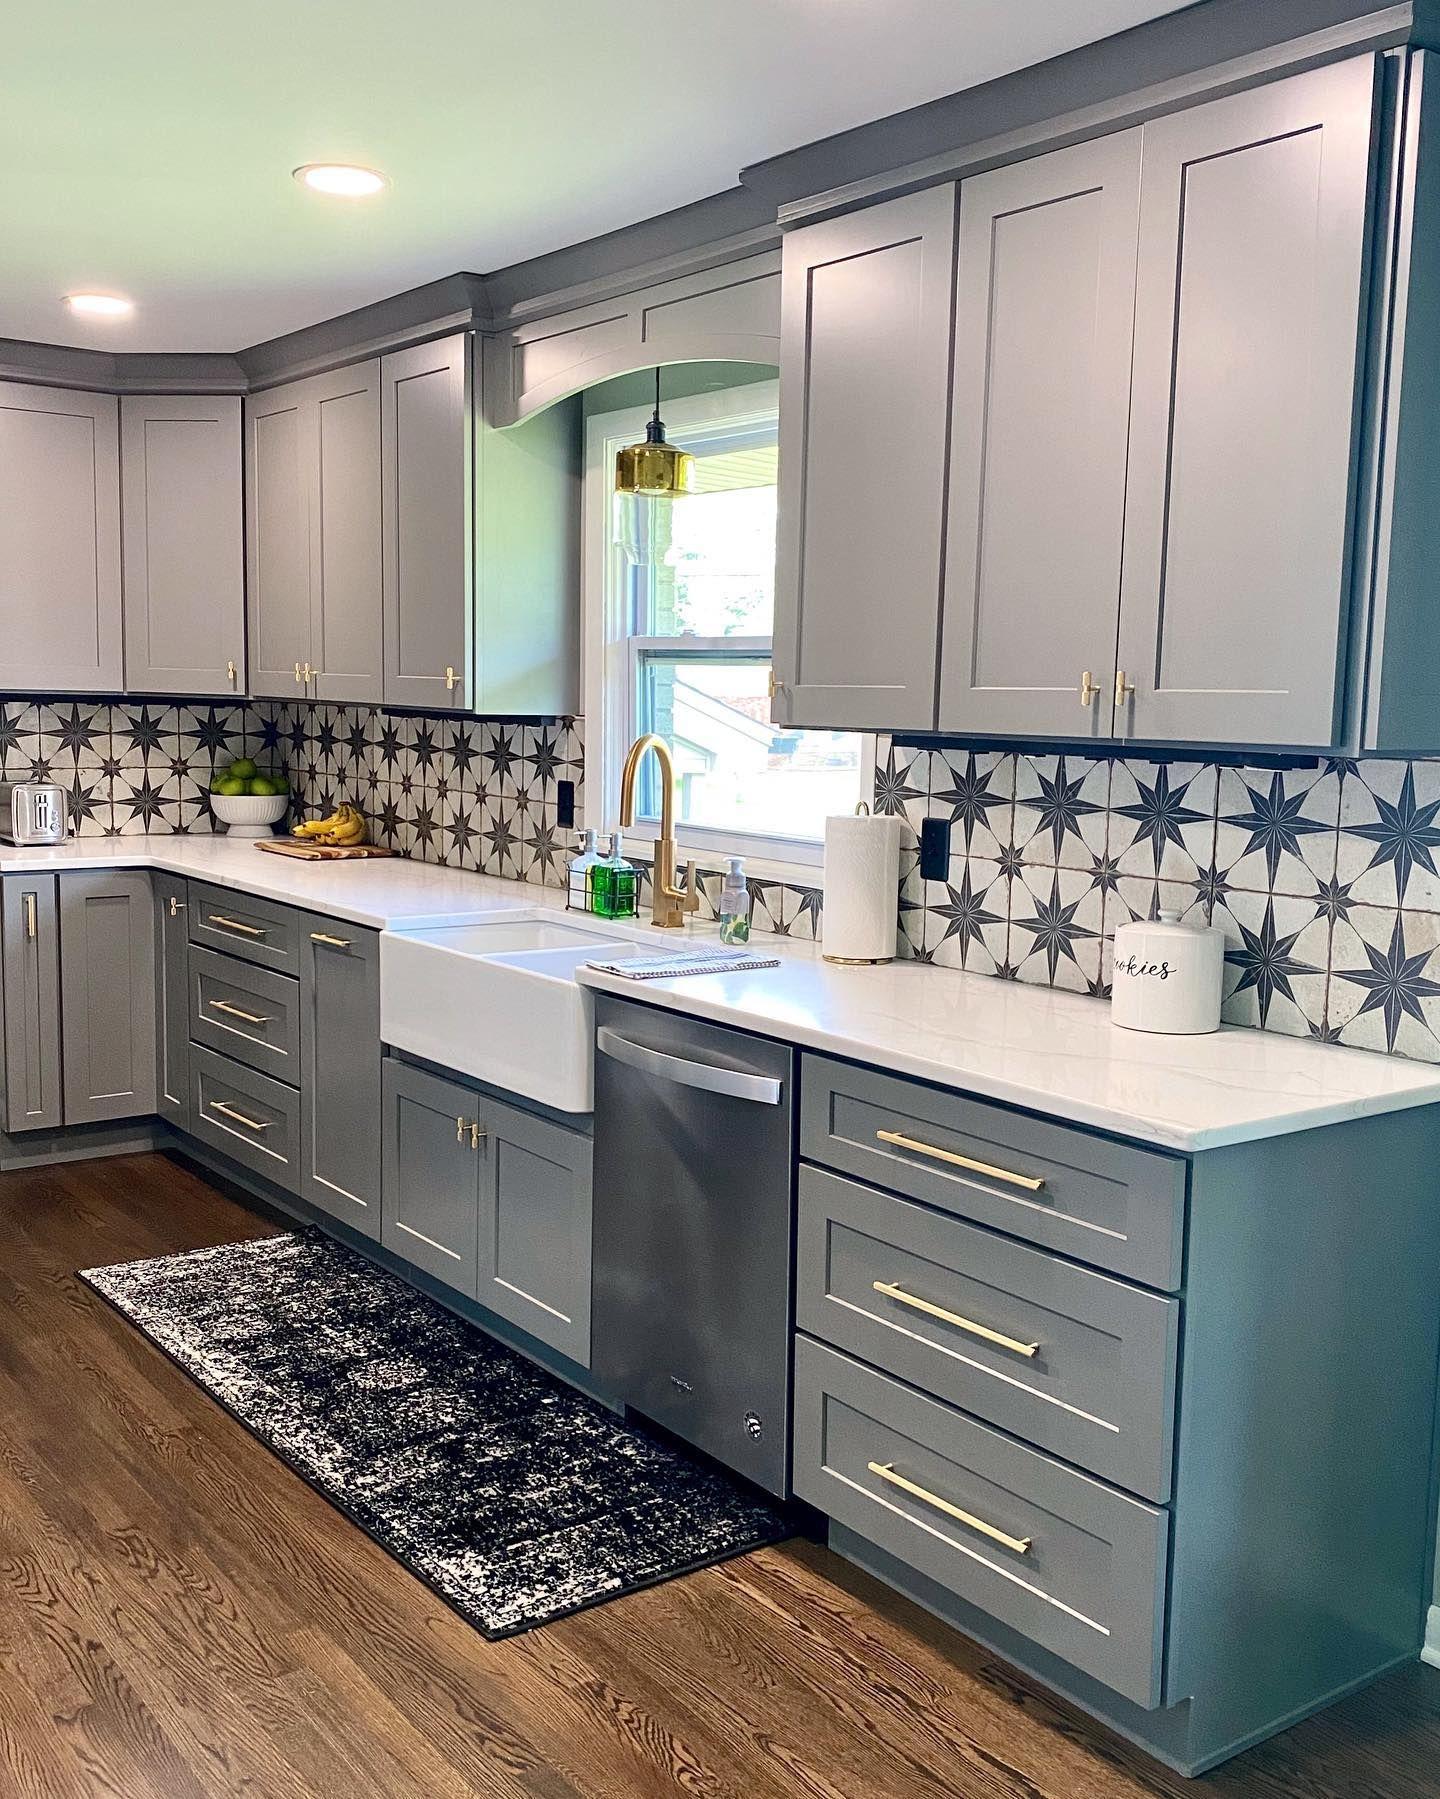 Best Quartz Countertops Colors For Your Kitchen In 2020 Kitchen Cabinet Design Kitchen Design White Kitchen Design